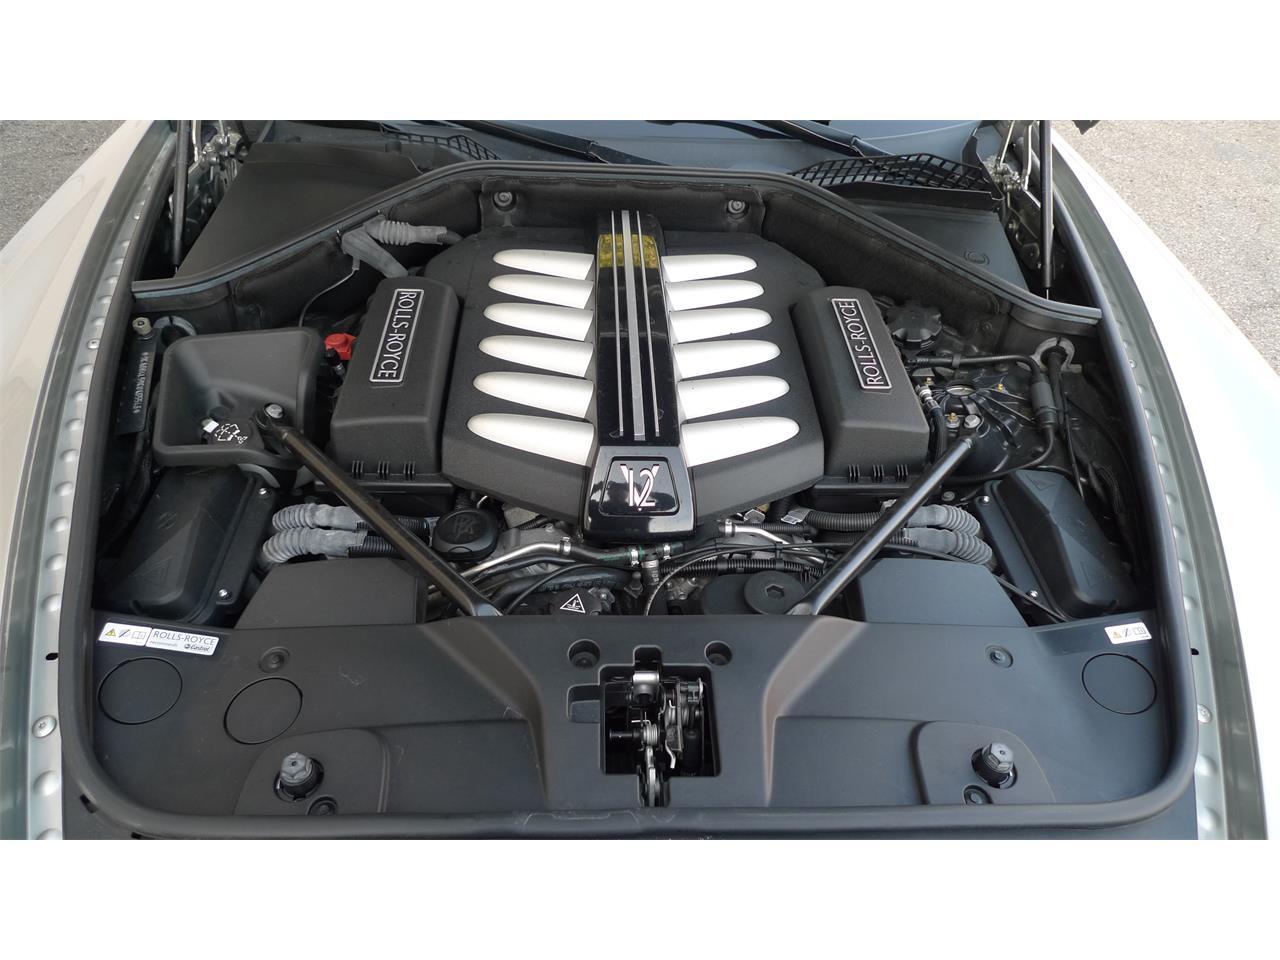 2012 Rolls-Royce Silver Ghost (CC-1310789) for sale in Anaheim, California